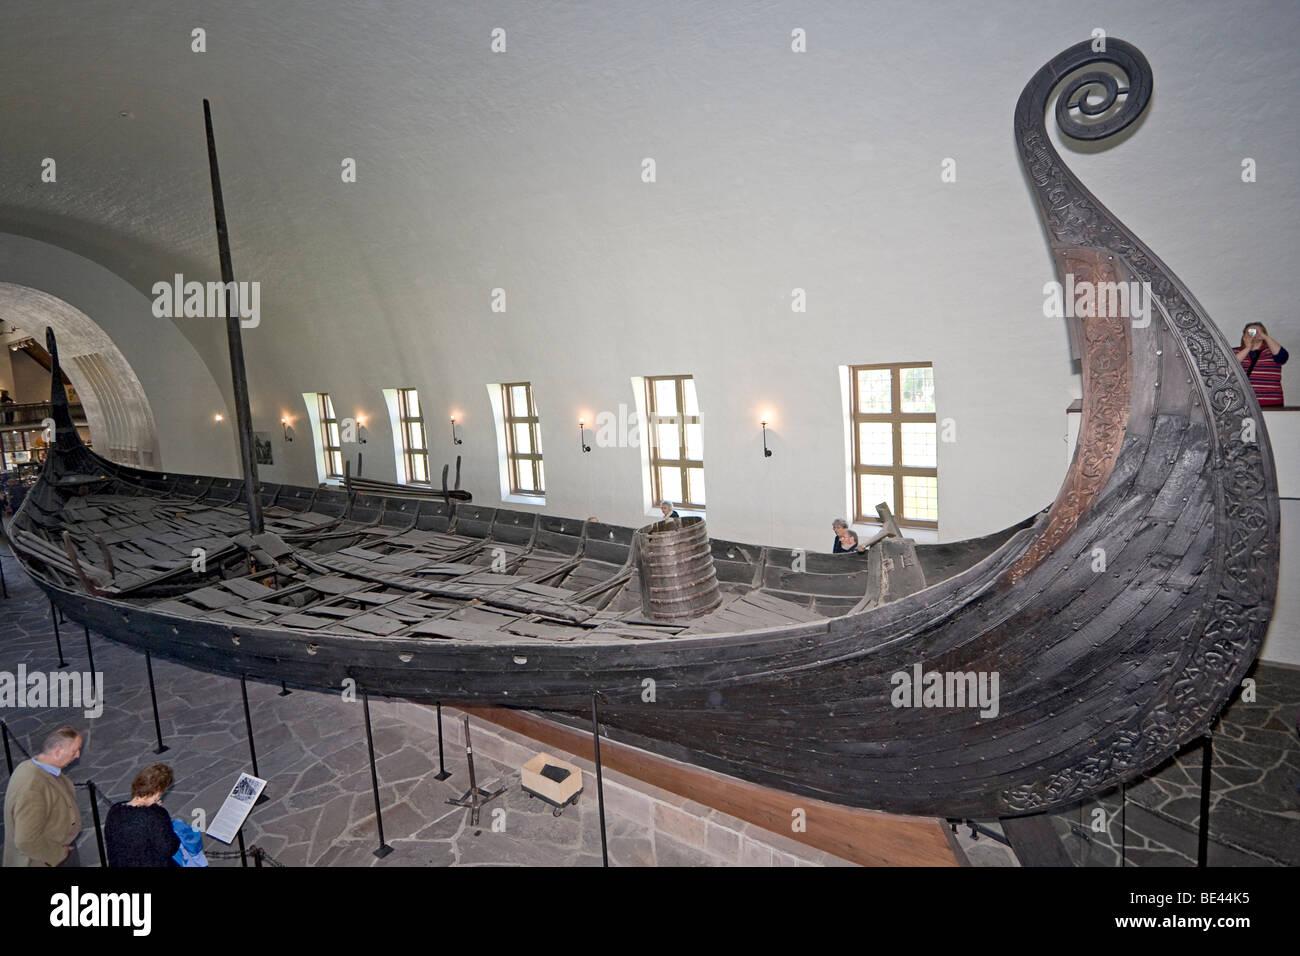 Oseburg ship in Viking Ship Museum in Oslo, Norway. - Stock Image